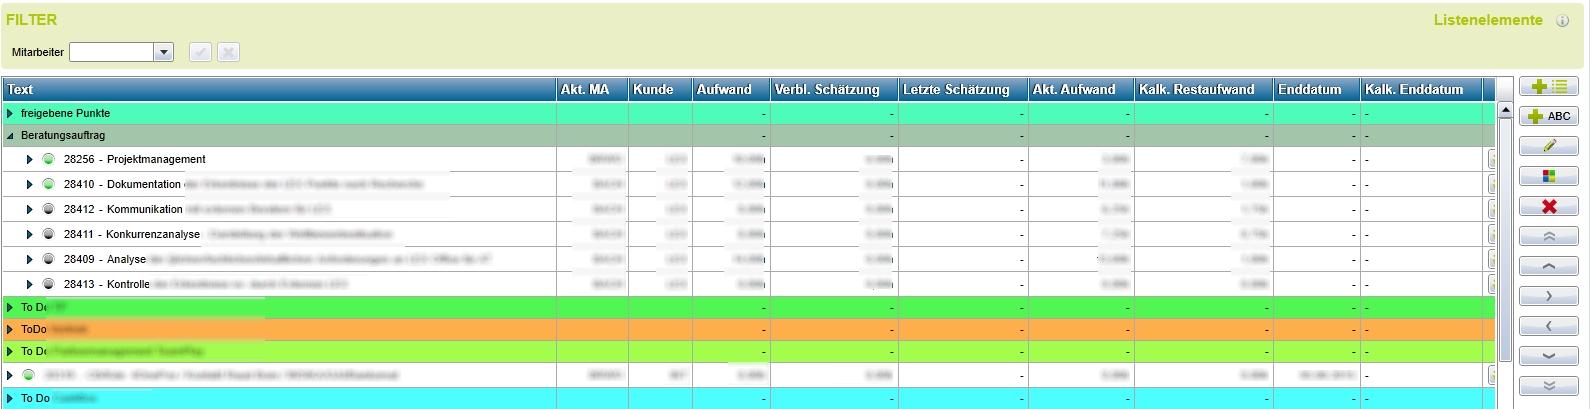 2.0.100 Prioritaetsliste mit Baumstruktur